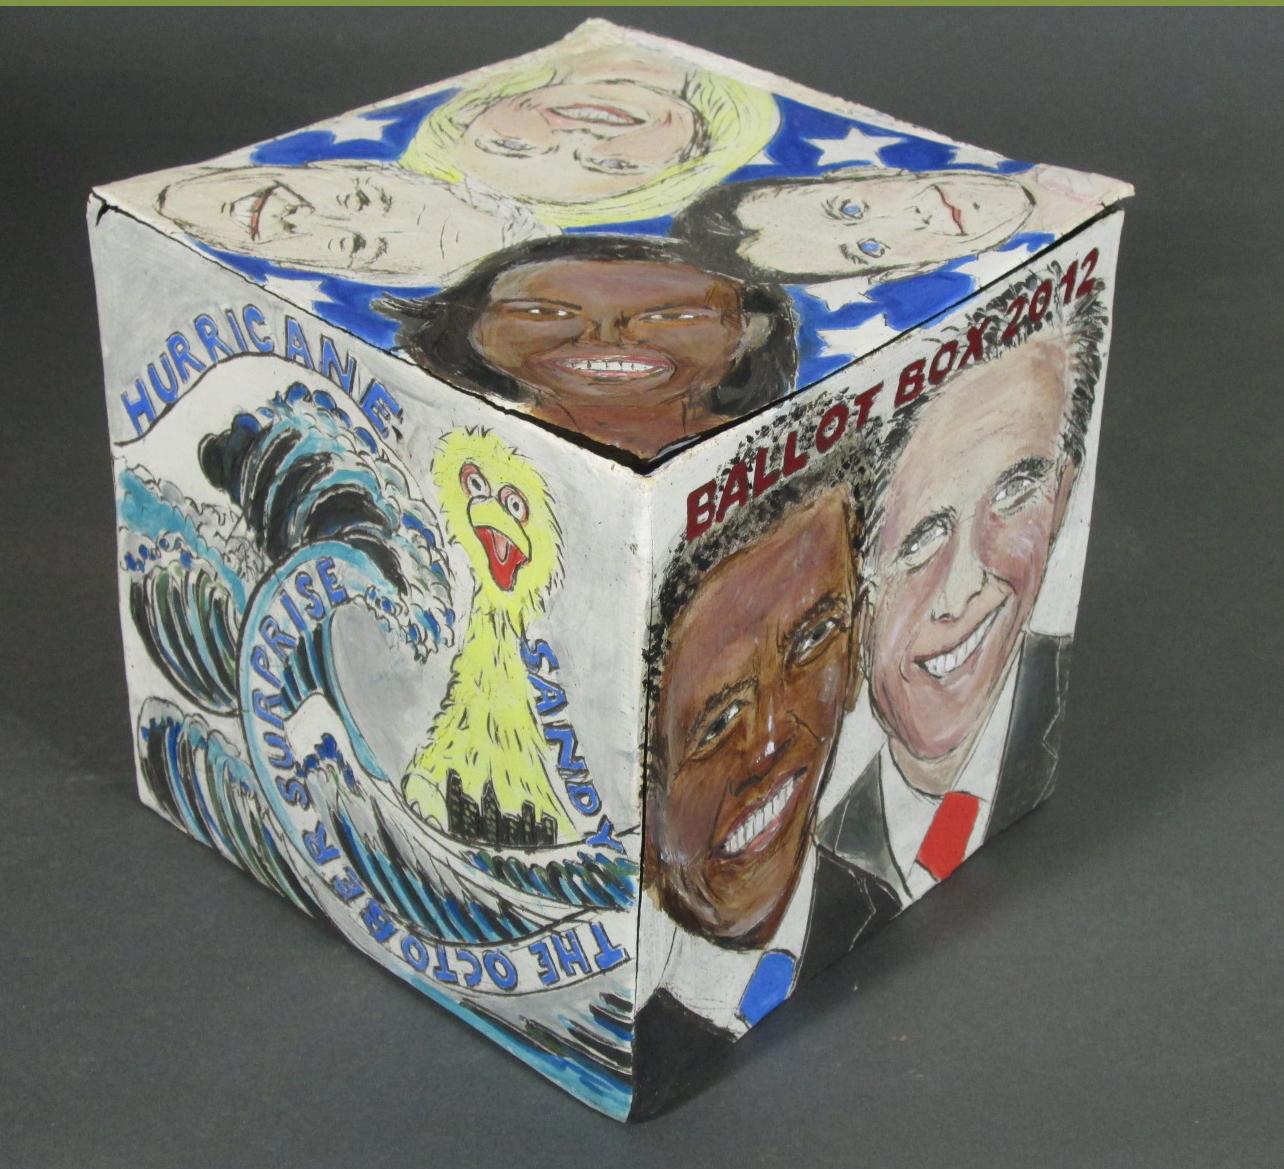 Ballot Box 2012 version 1